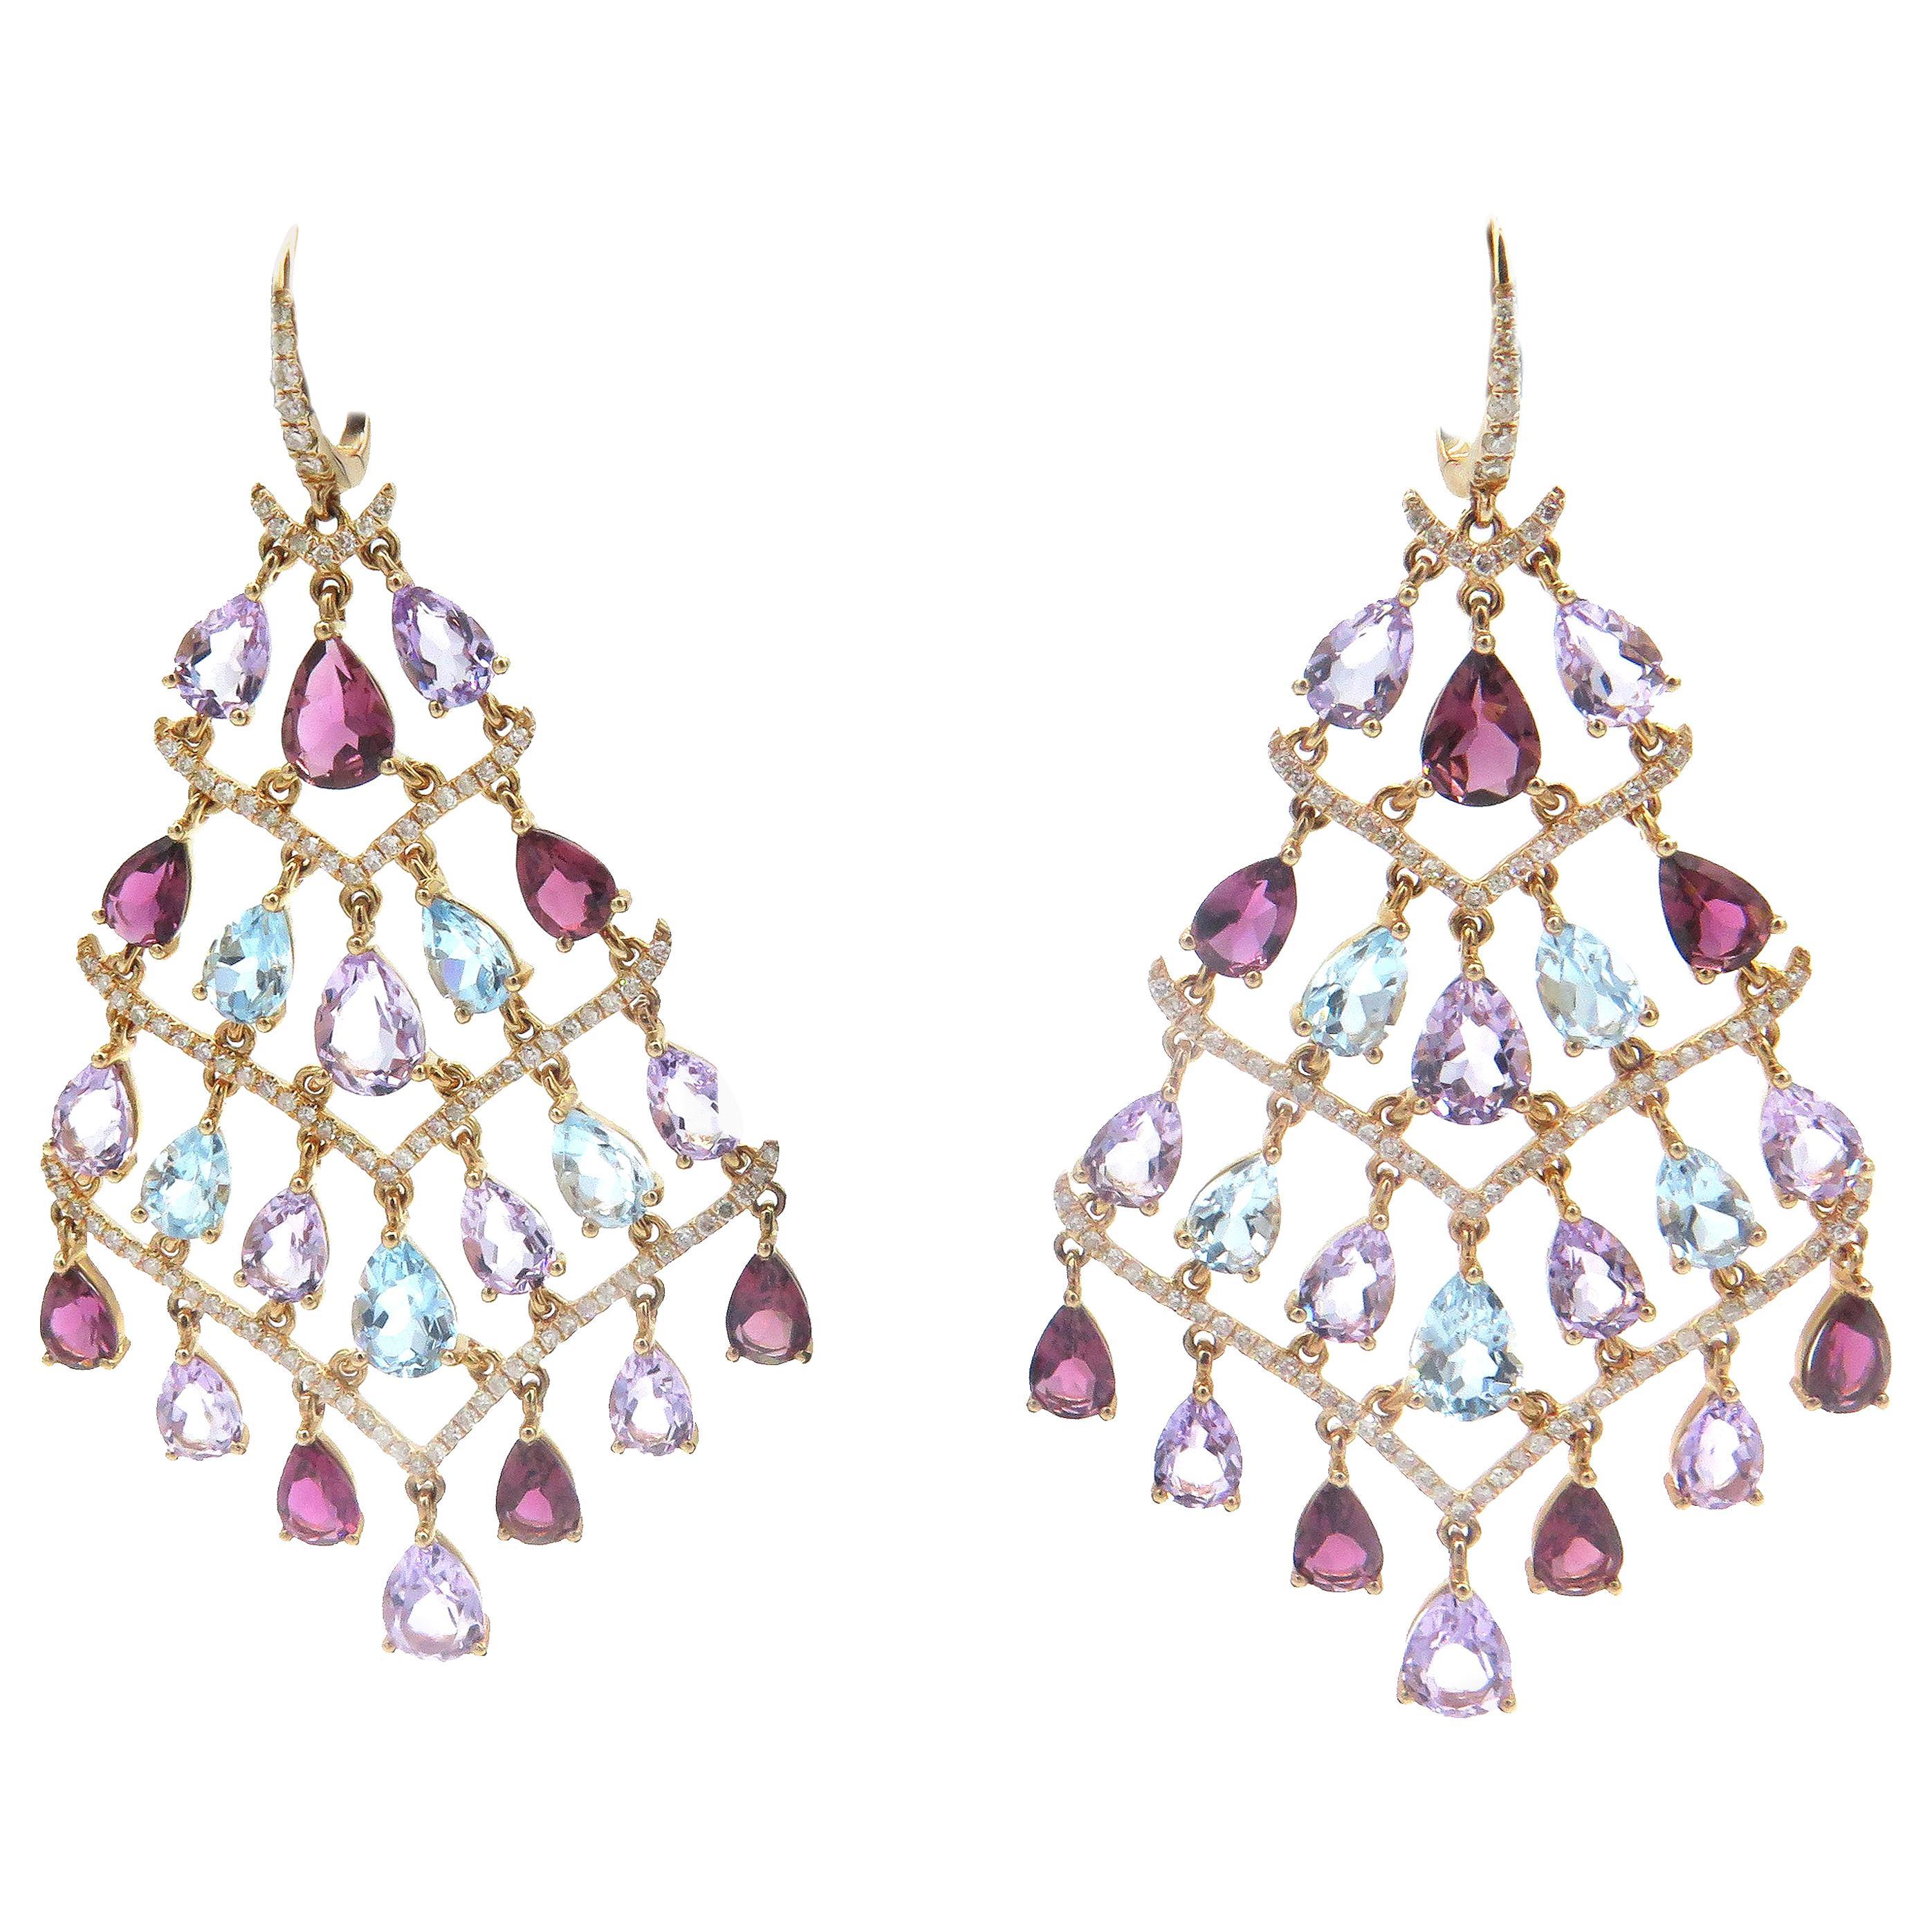 14 Karat Yellow Gold and Diamond Multicolored Stones